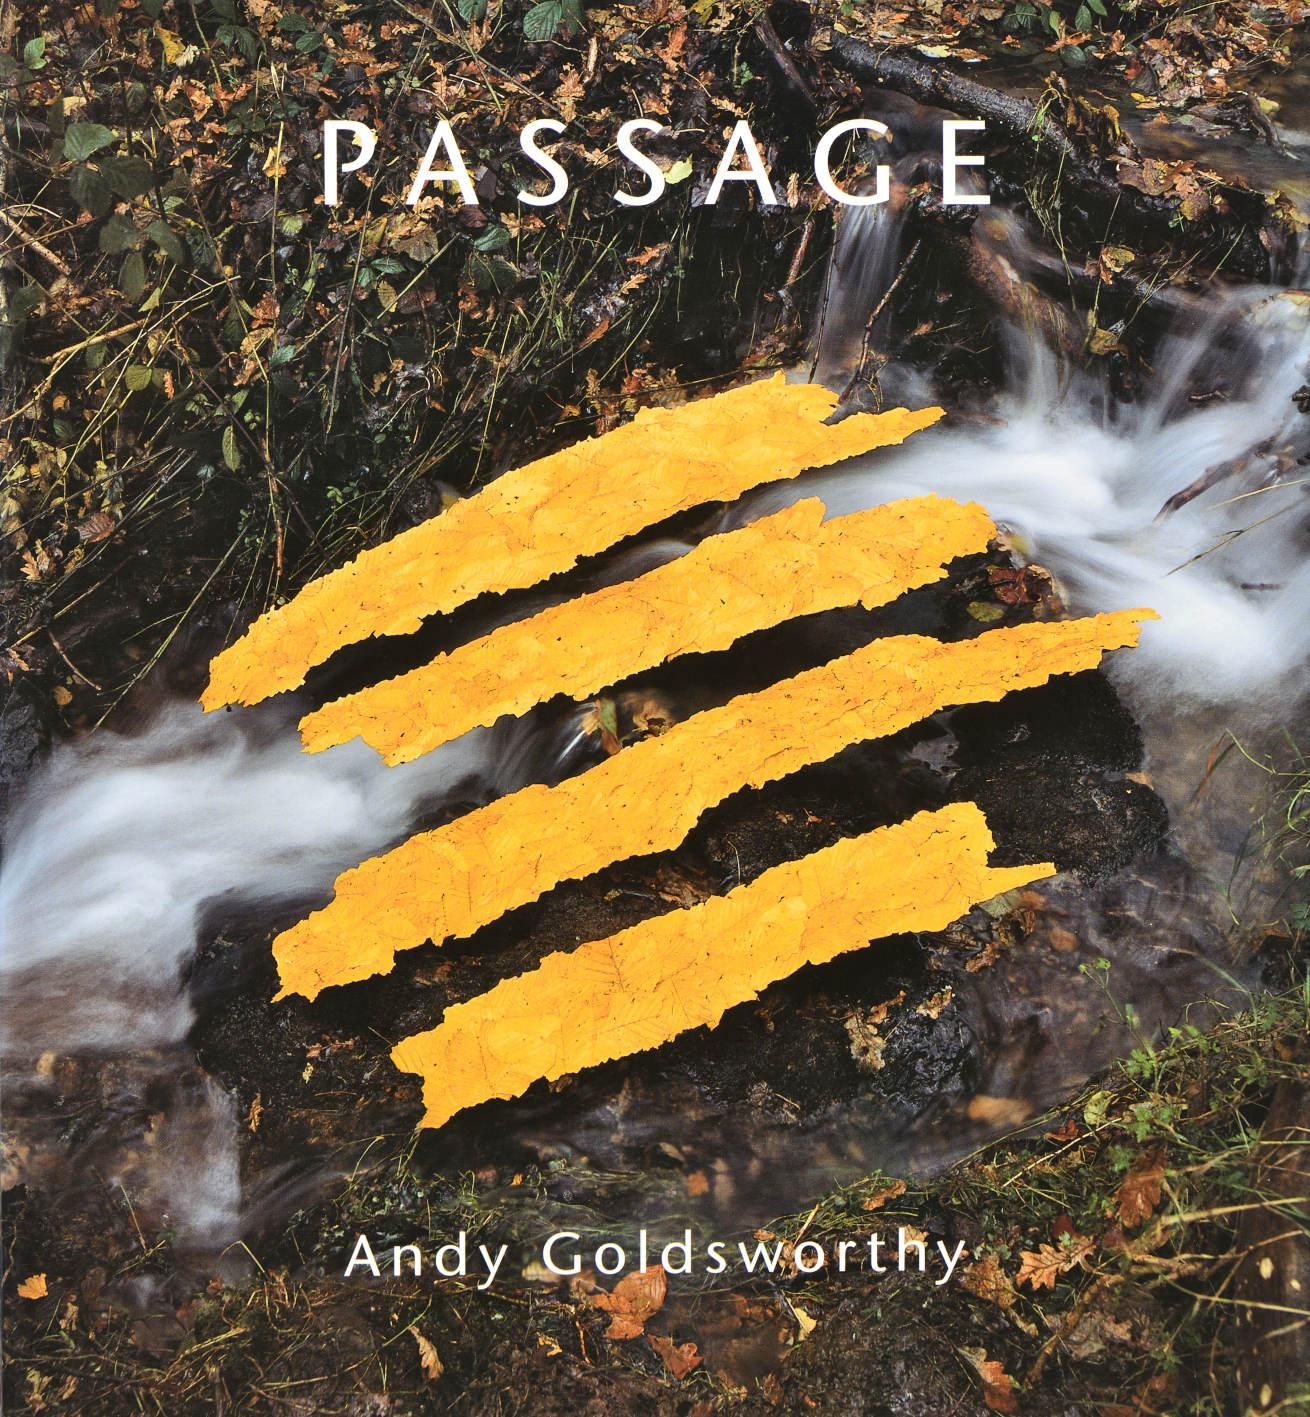 Andy Goldsworthy Passage.jpg